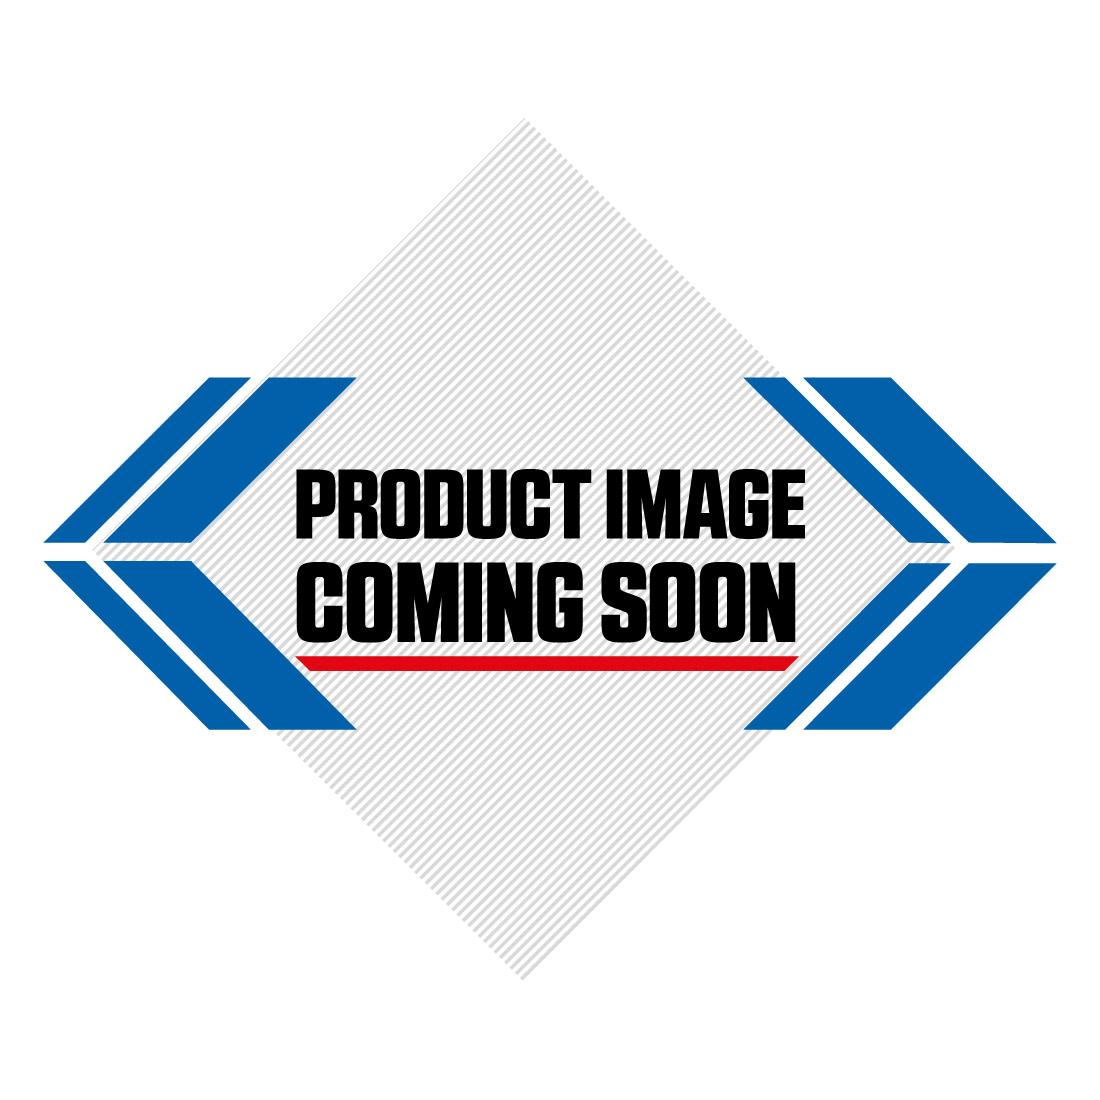 Suzuki Plastic Kit RMZ 450 (11-12) OEM Factory Image-3>